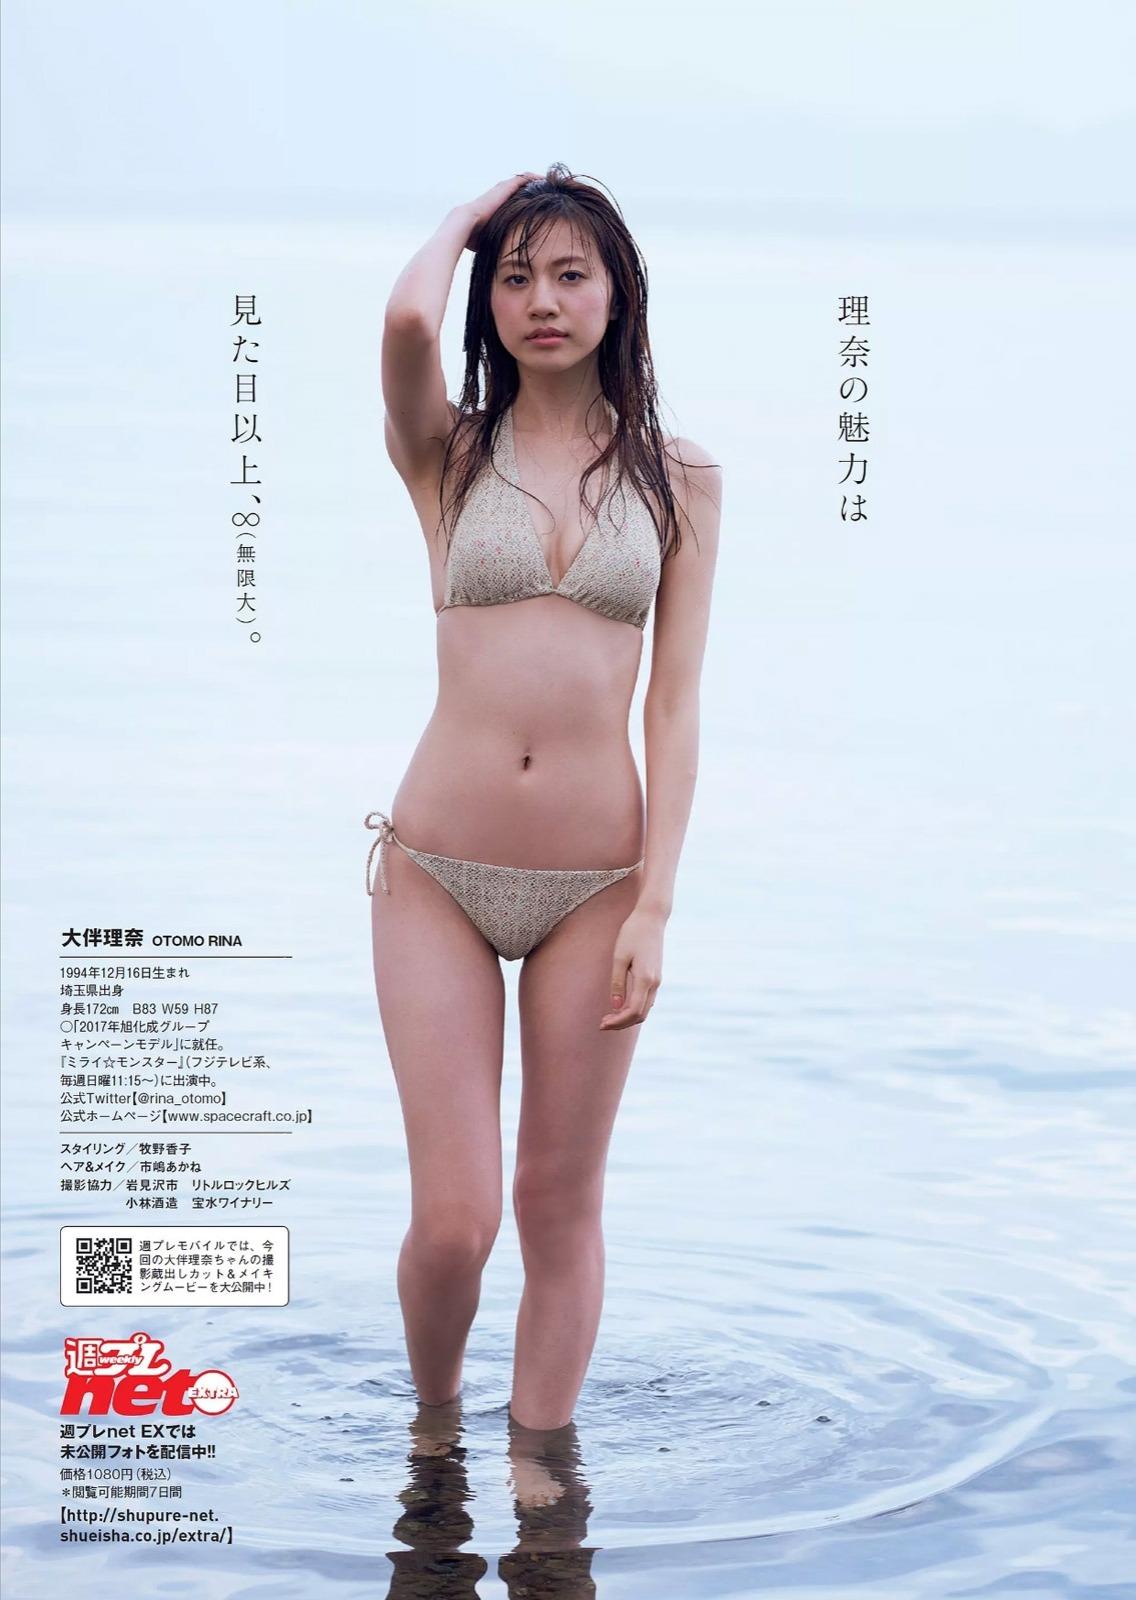 Rina Otomo 大伴理奈, Weekly Playboy 2017 No.41 (週刊プレイボーイ 2017年41号)